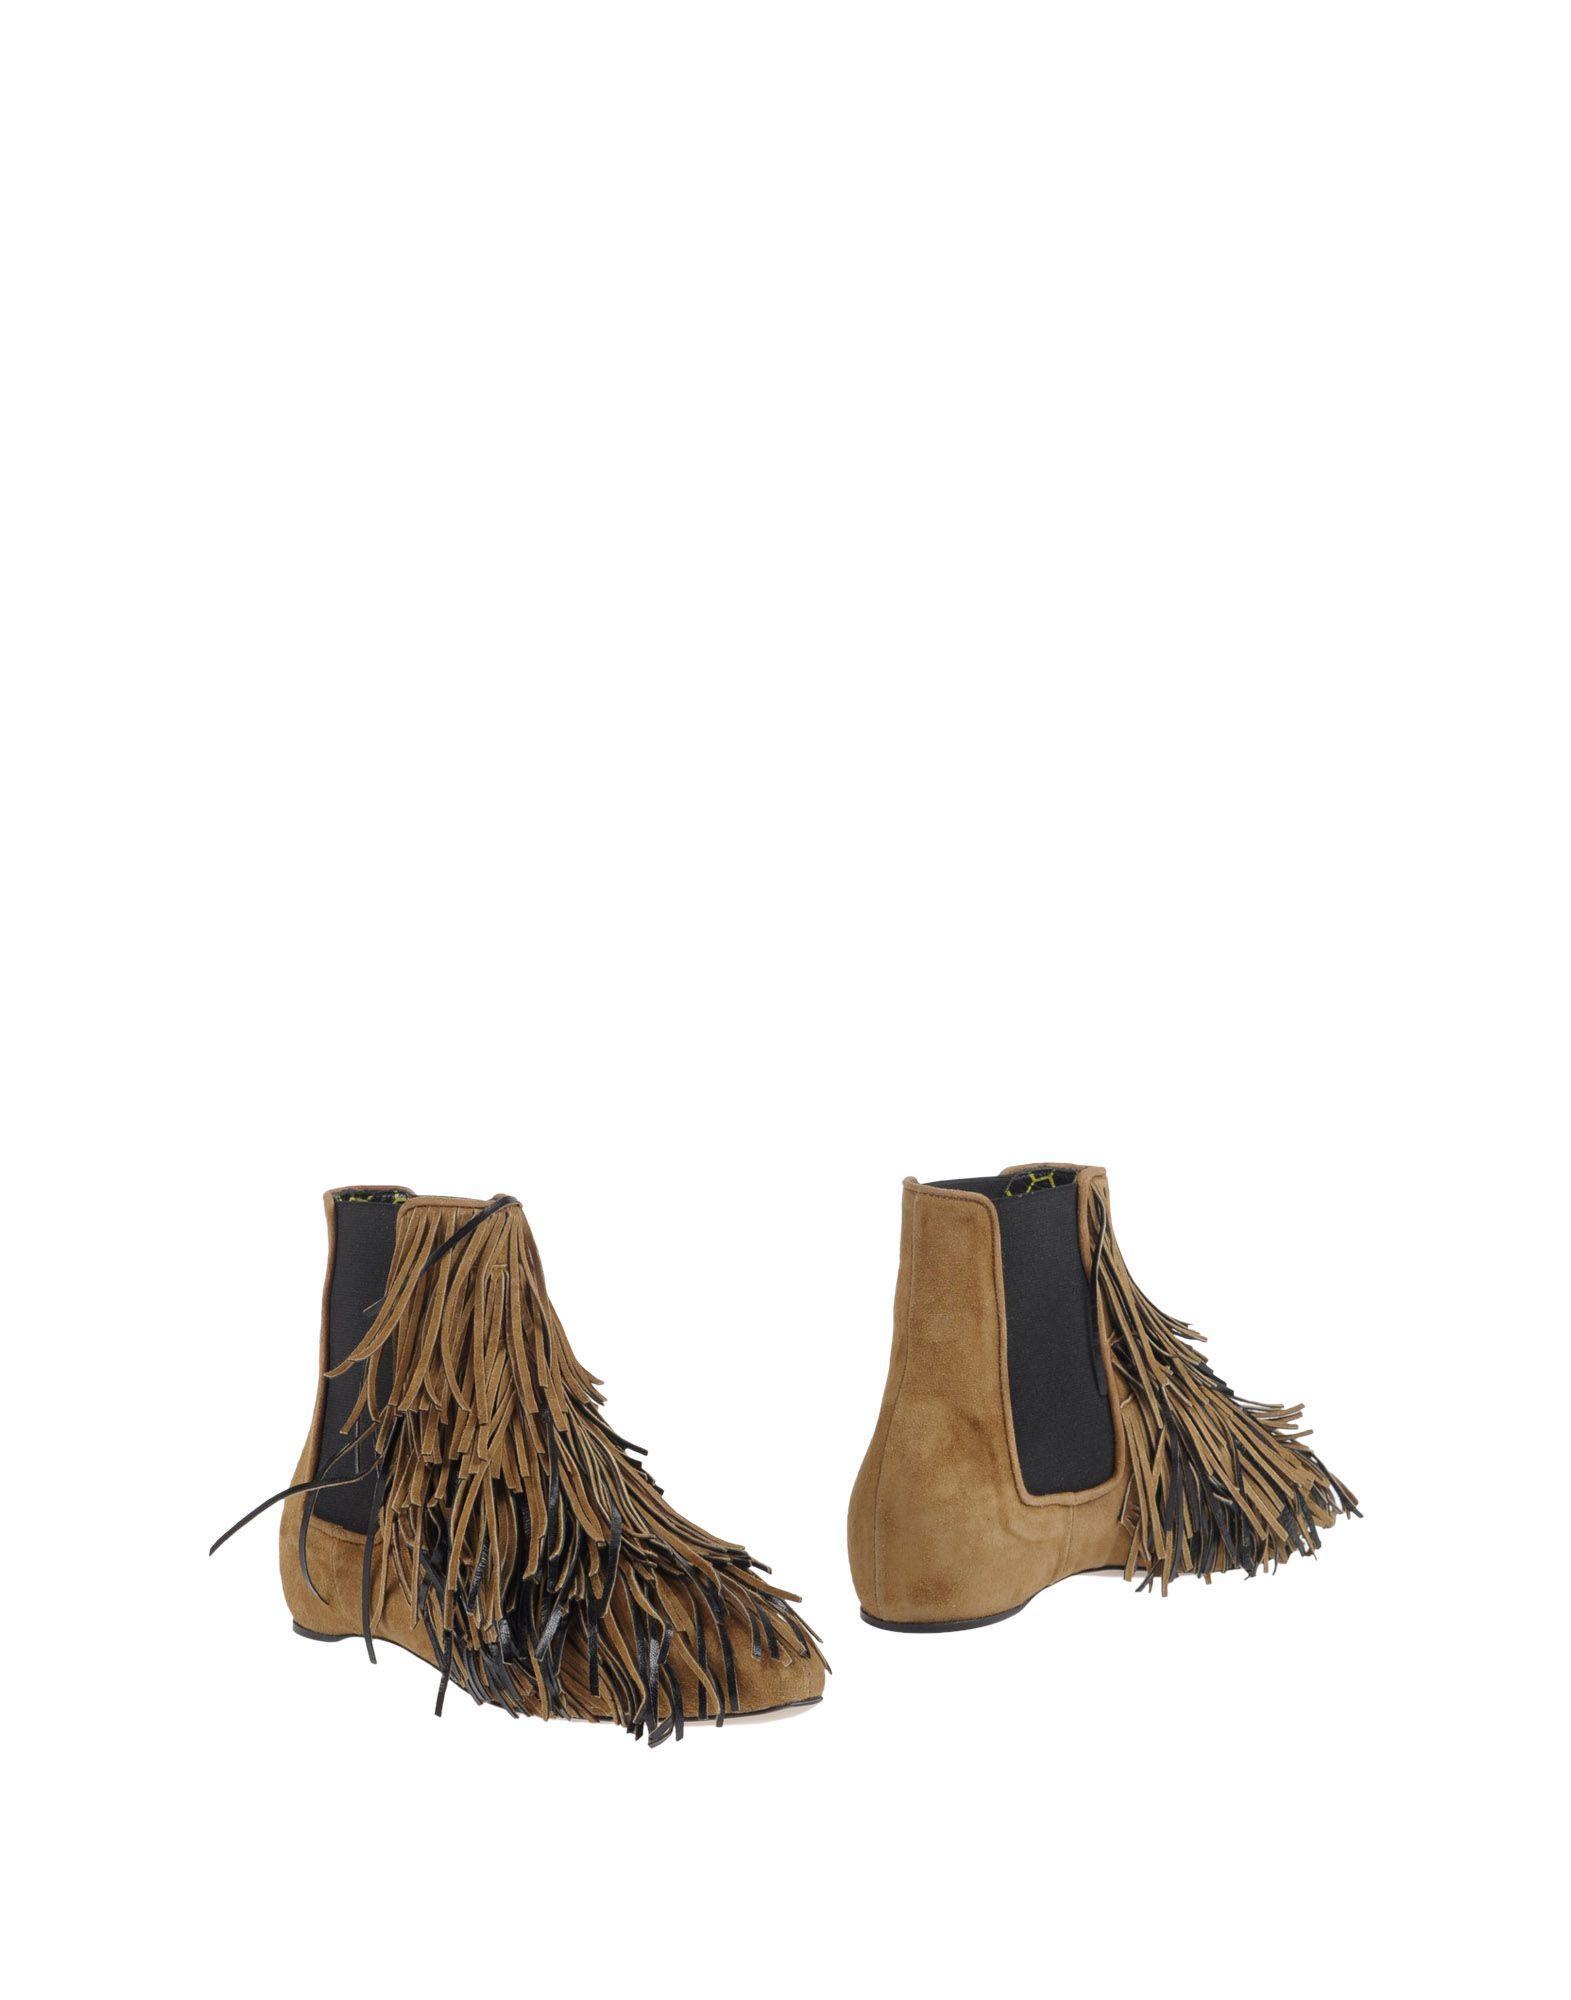 DANIELE MICHETTI Полусапоги и высокие ботинки daniele michetti daniele michetti ботильоны женские 132